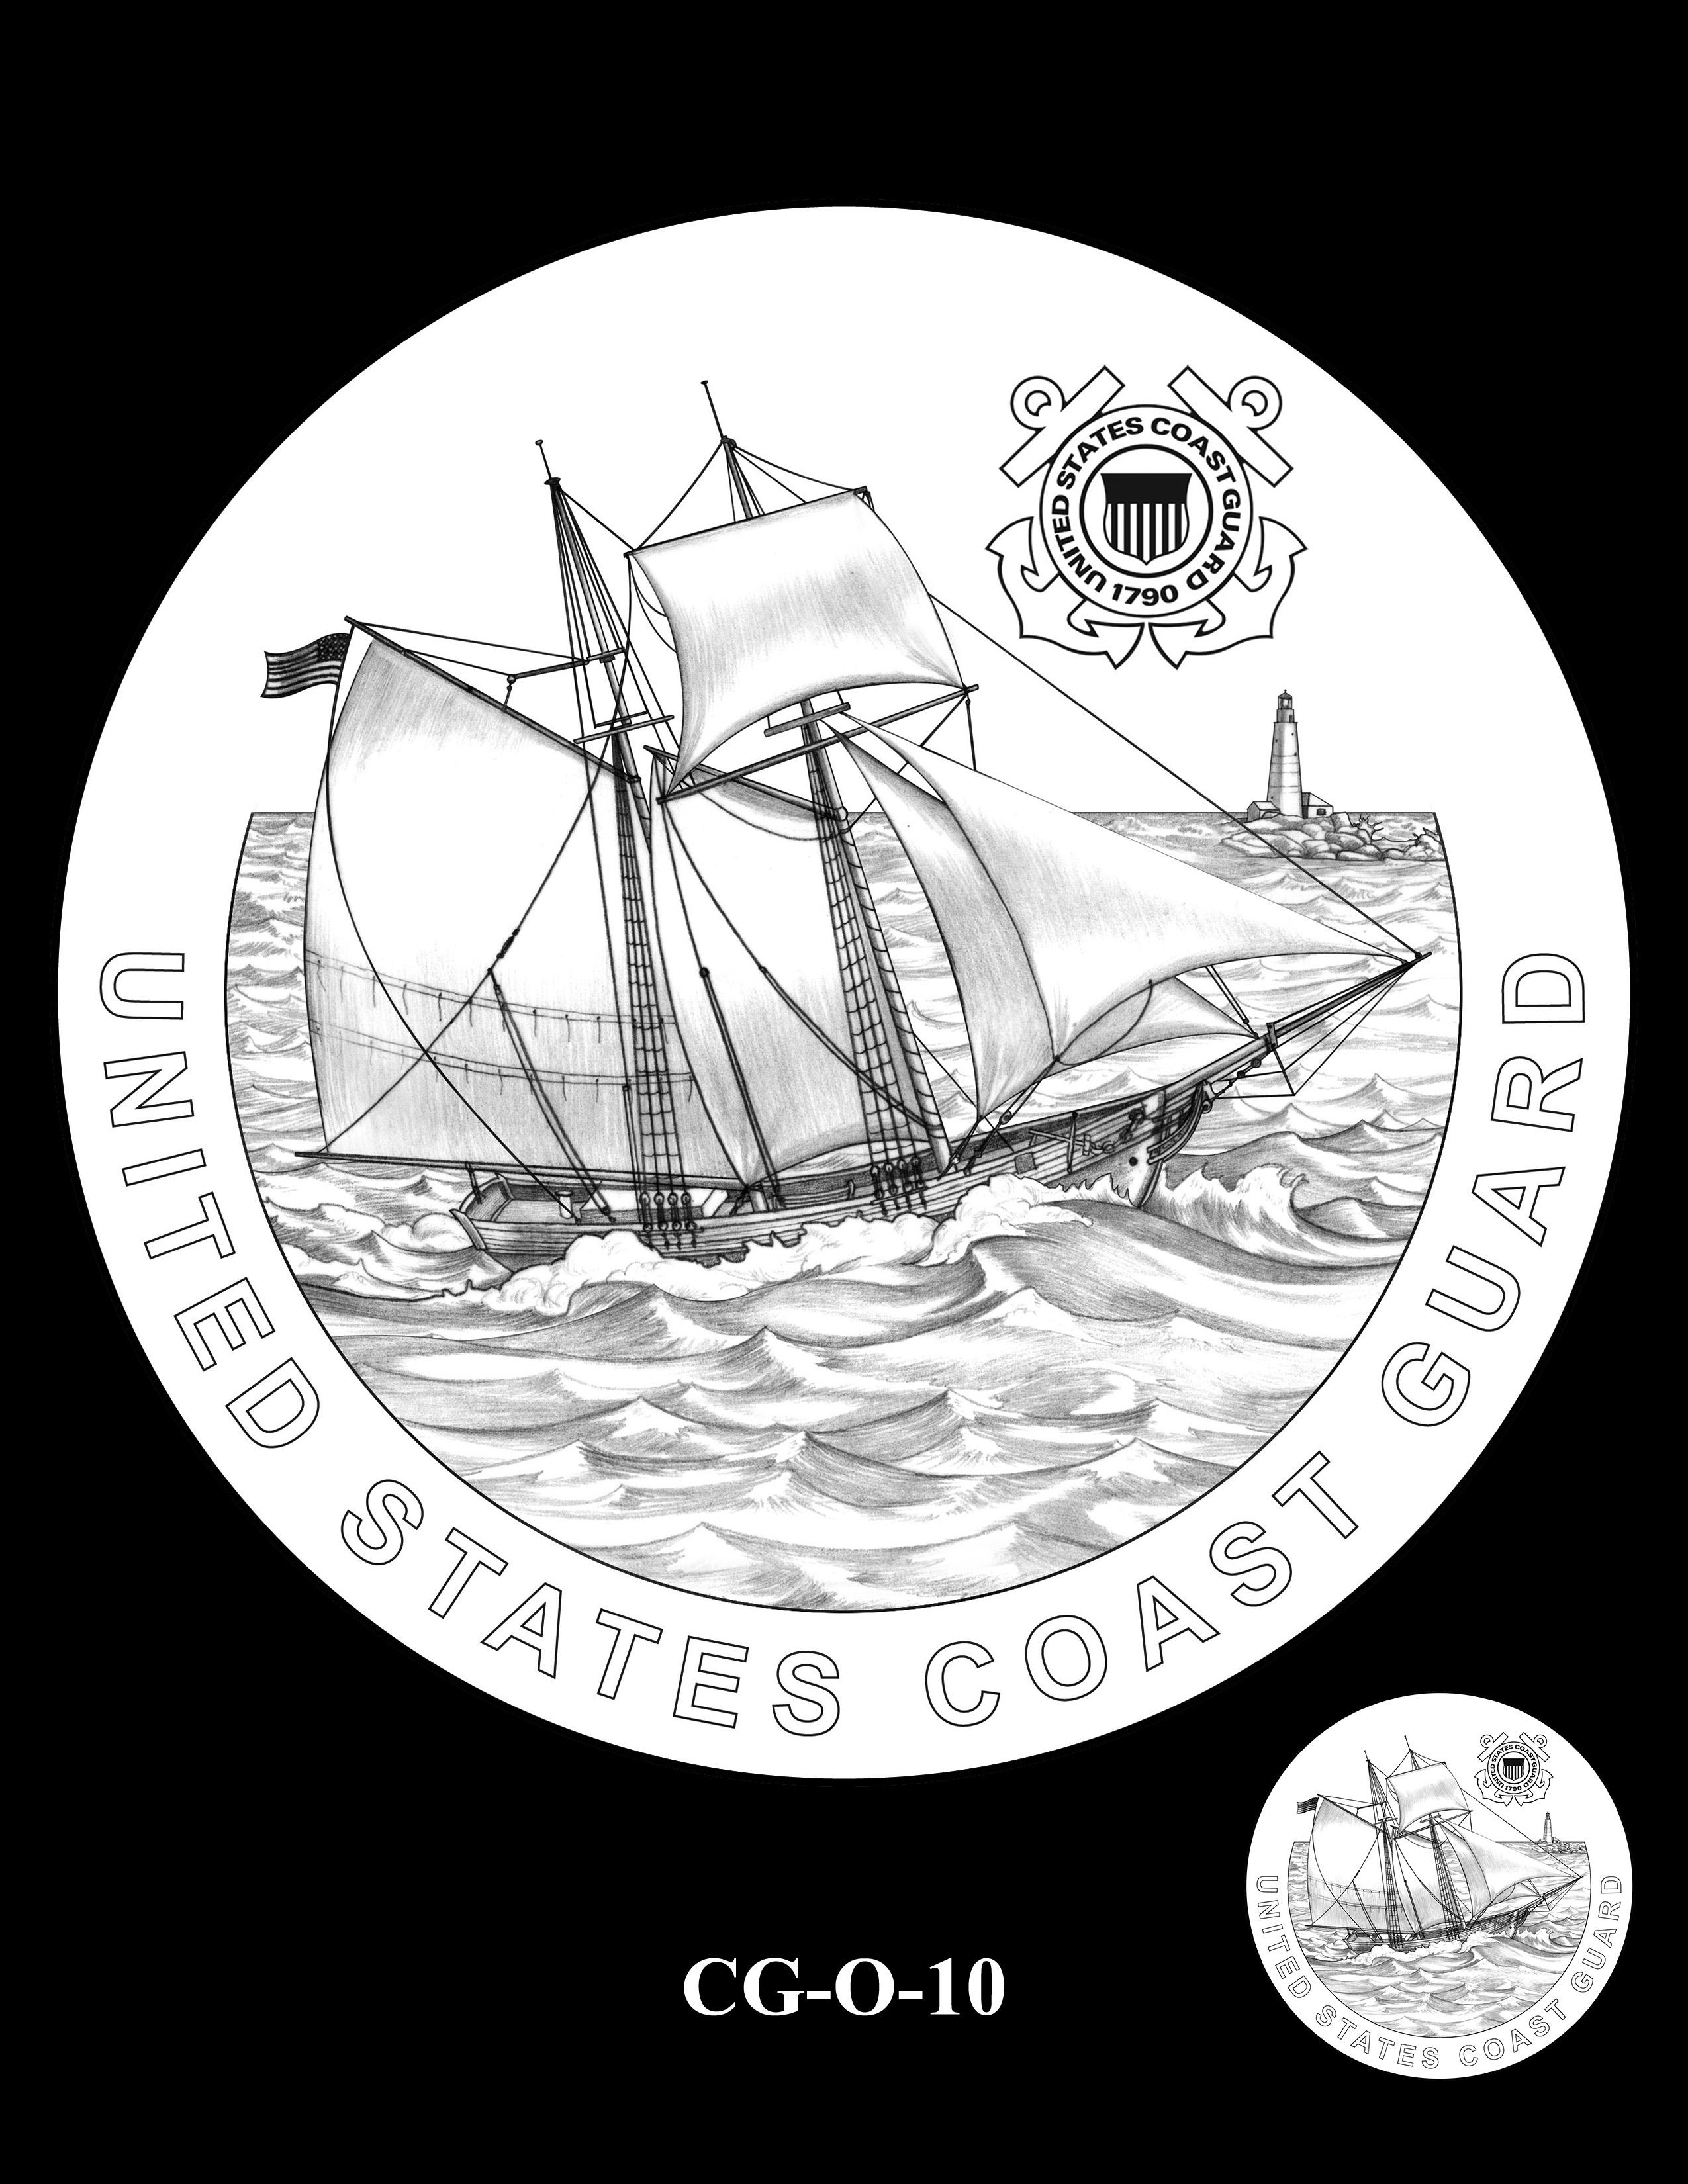 CG-O-10 -- Armed Forces Medal - Coast Guard